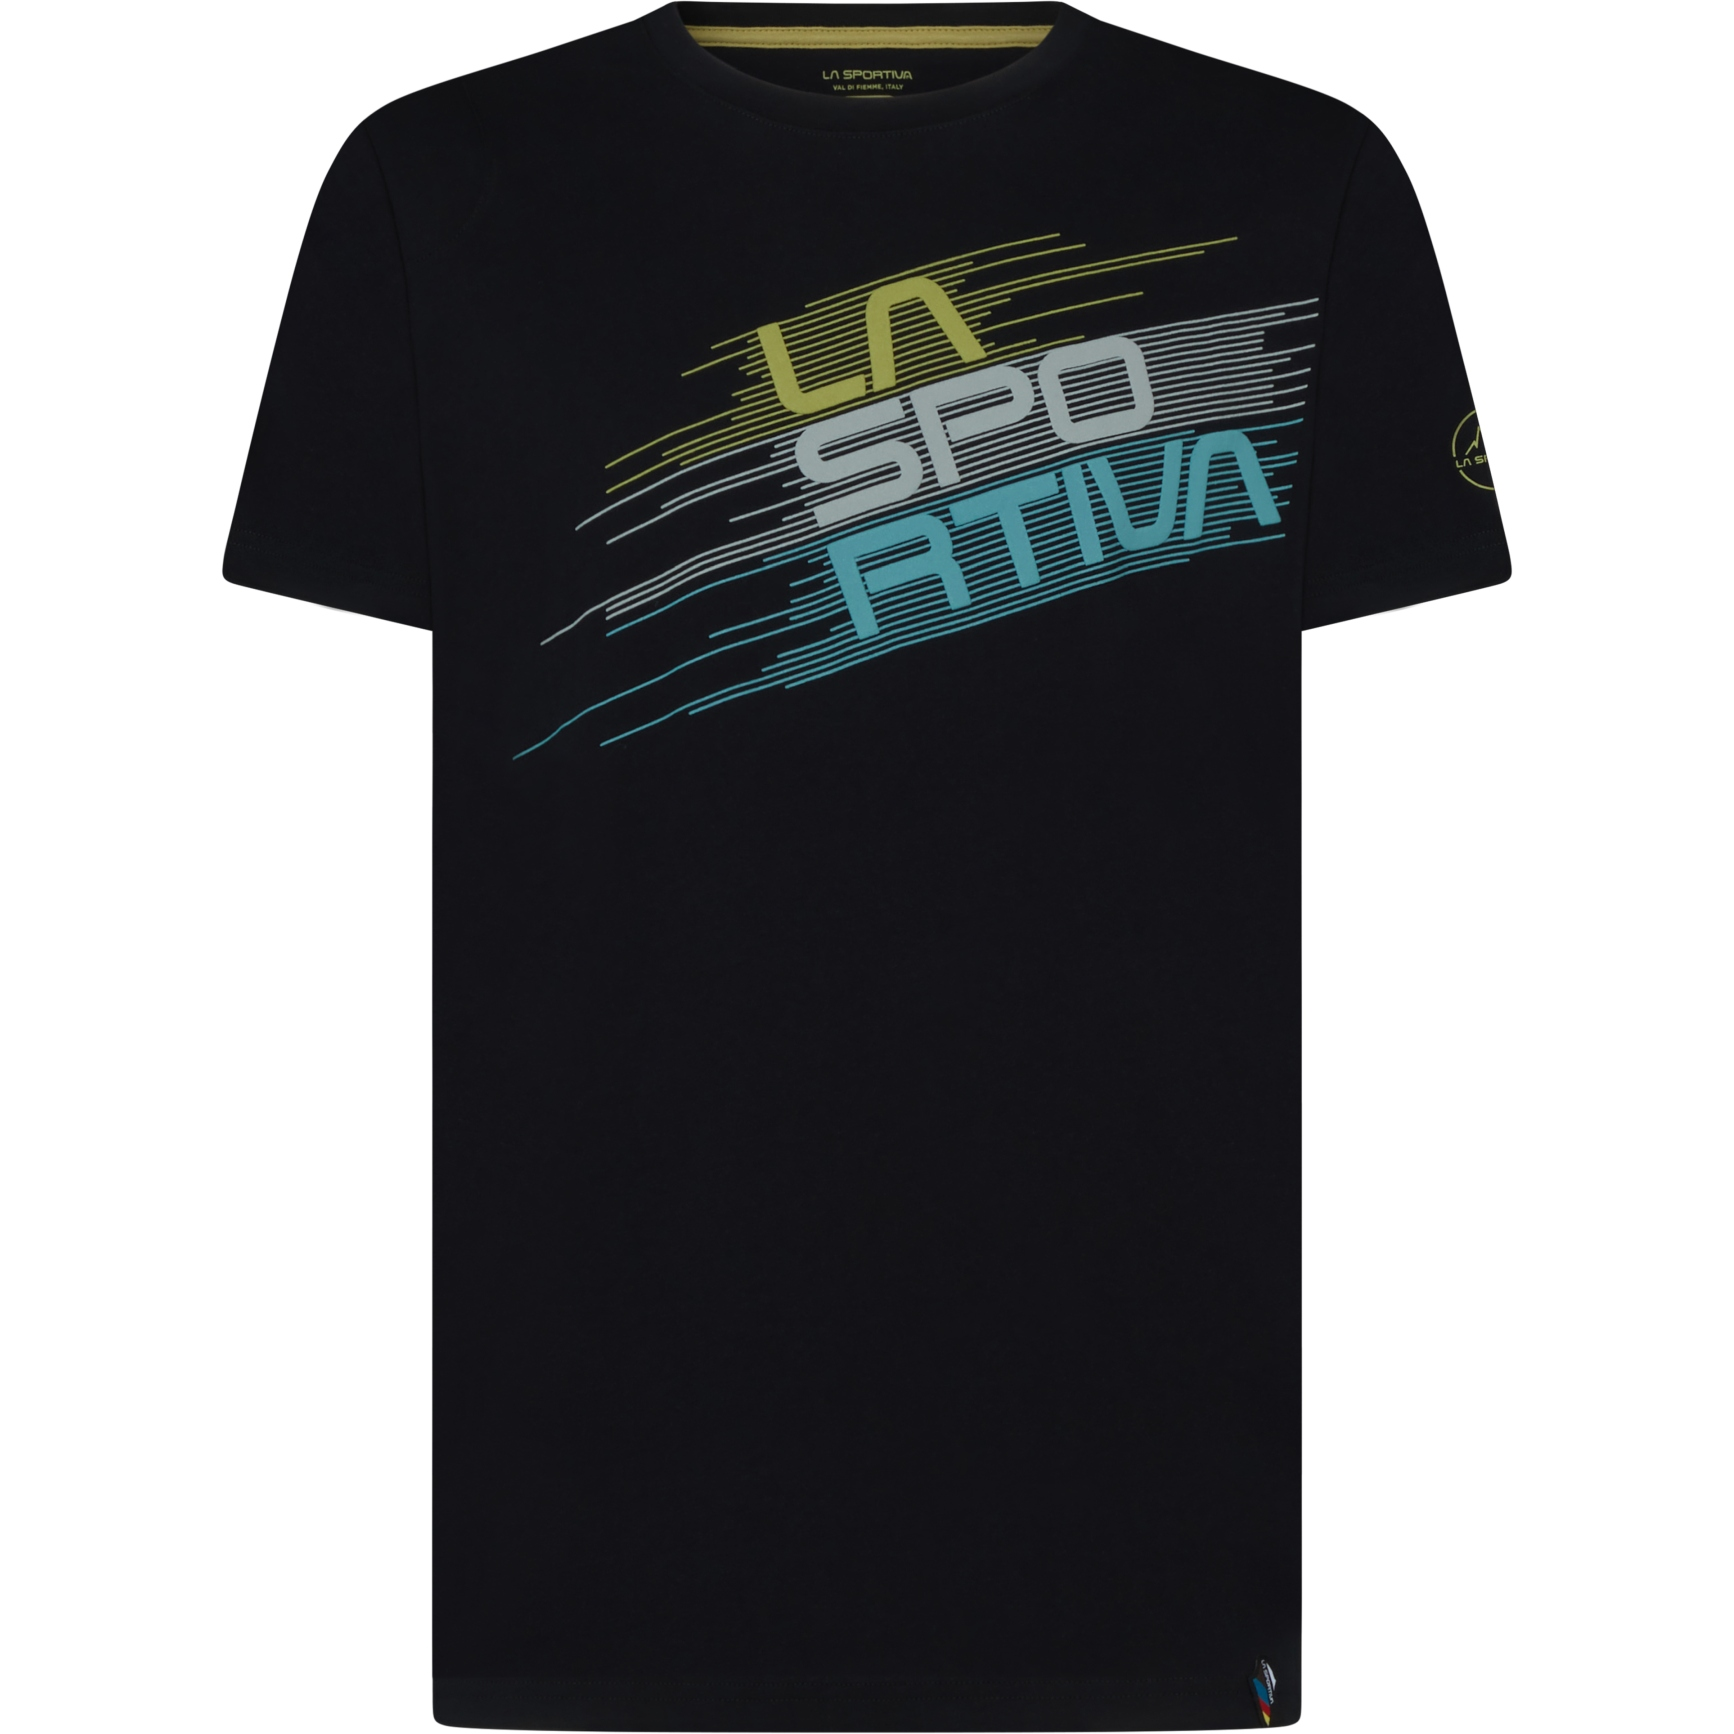 La Sportiva Stripe Evo T-Shirt - Schwarz